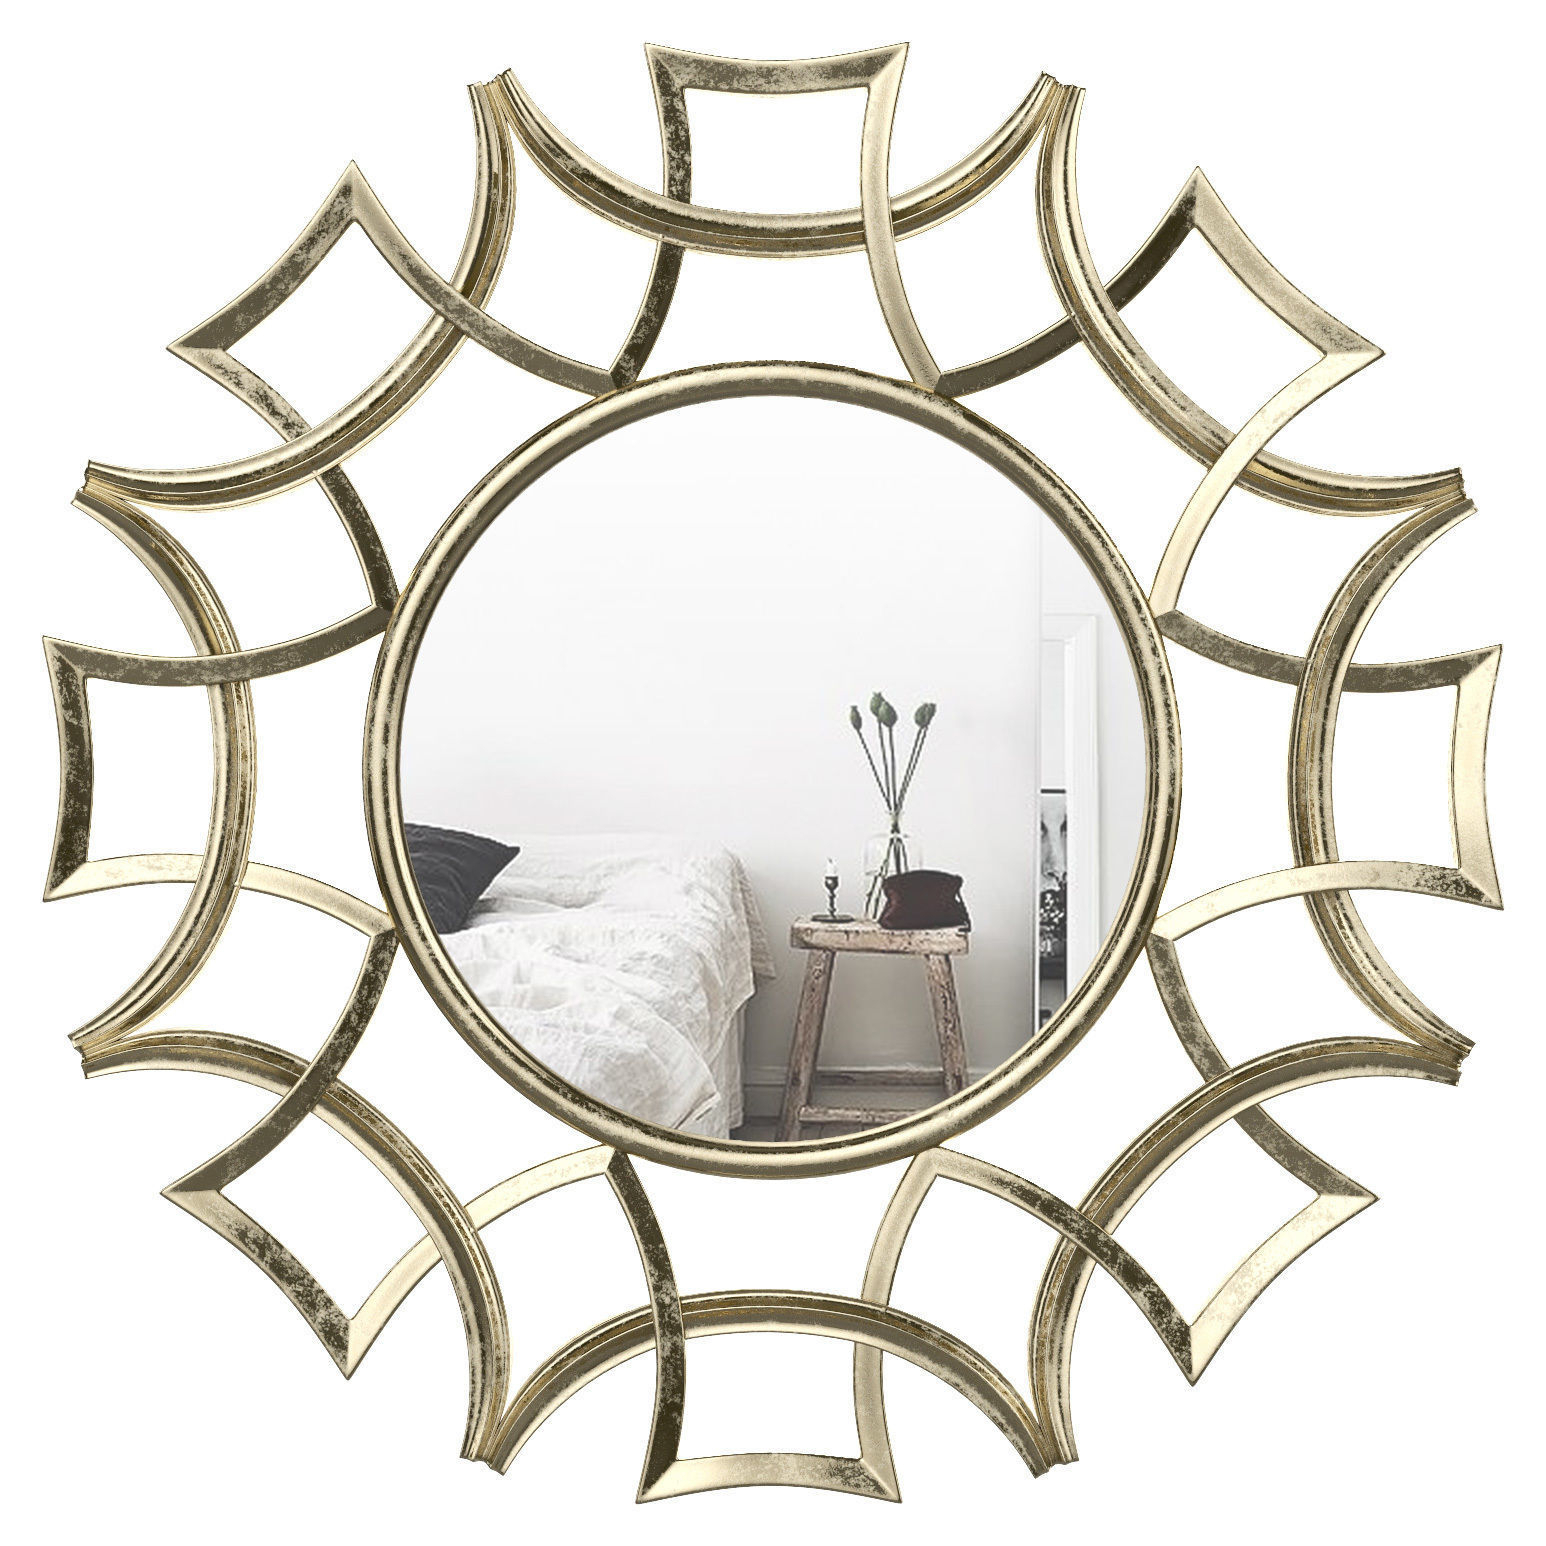 Brylee Traditional Sunburst Mirror Wrlo6935 | 3D Model With Brylee Traditional Sunburst Mirrors (View 2 of 20)